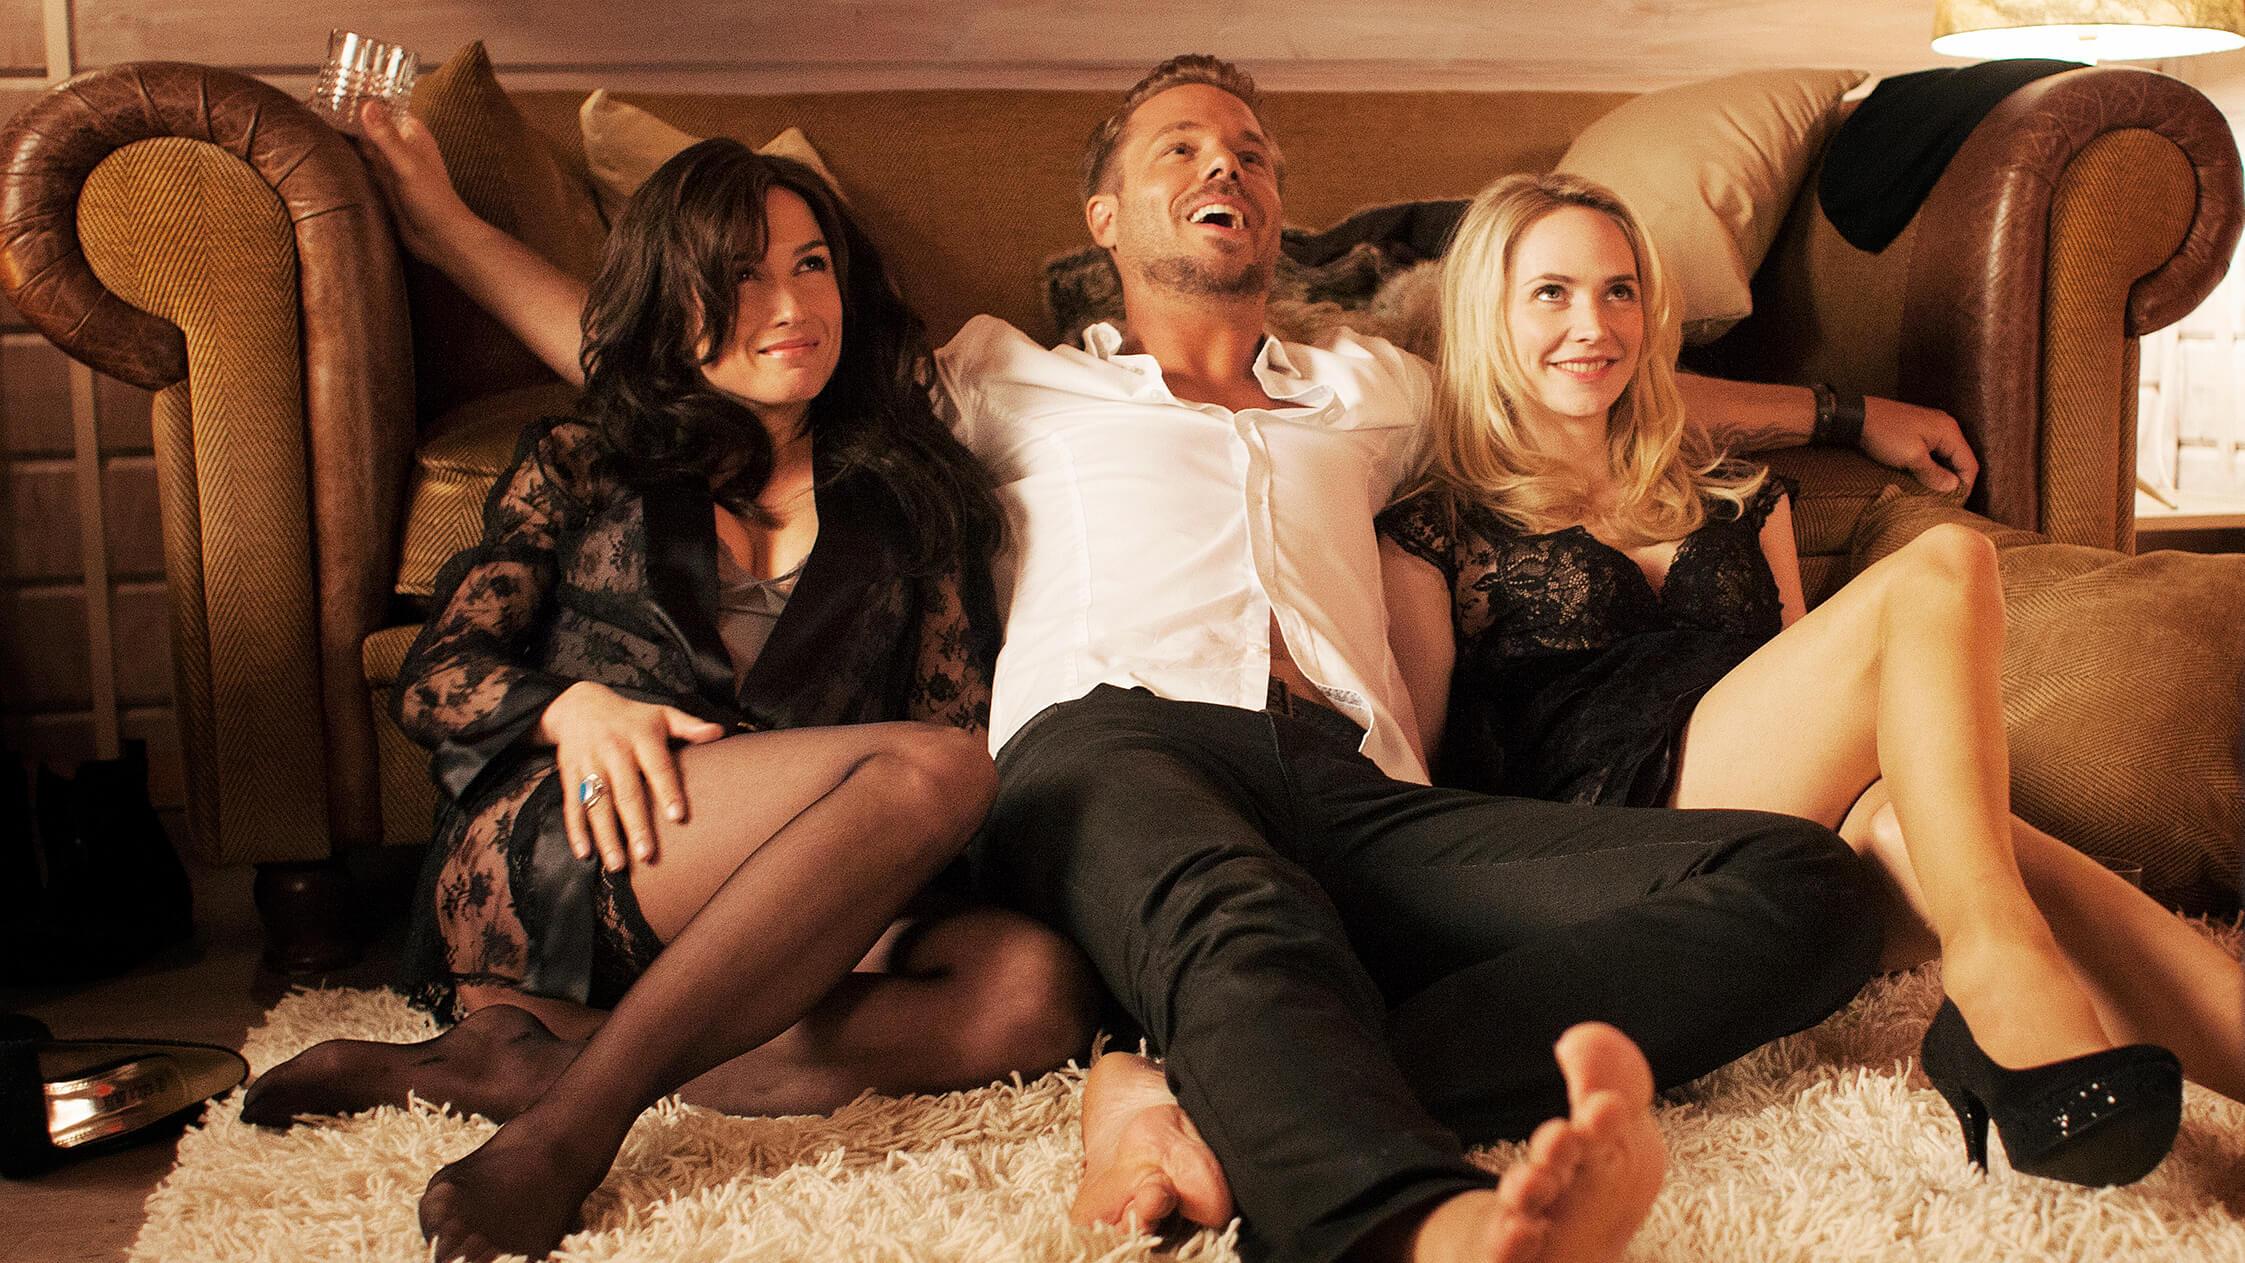 Dutch TV shows - The Neighbors